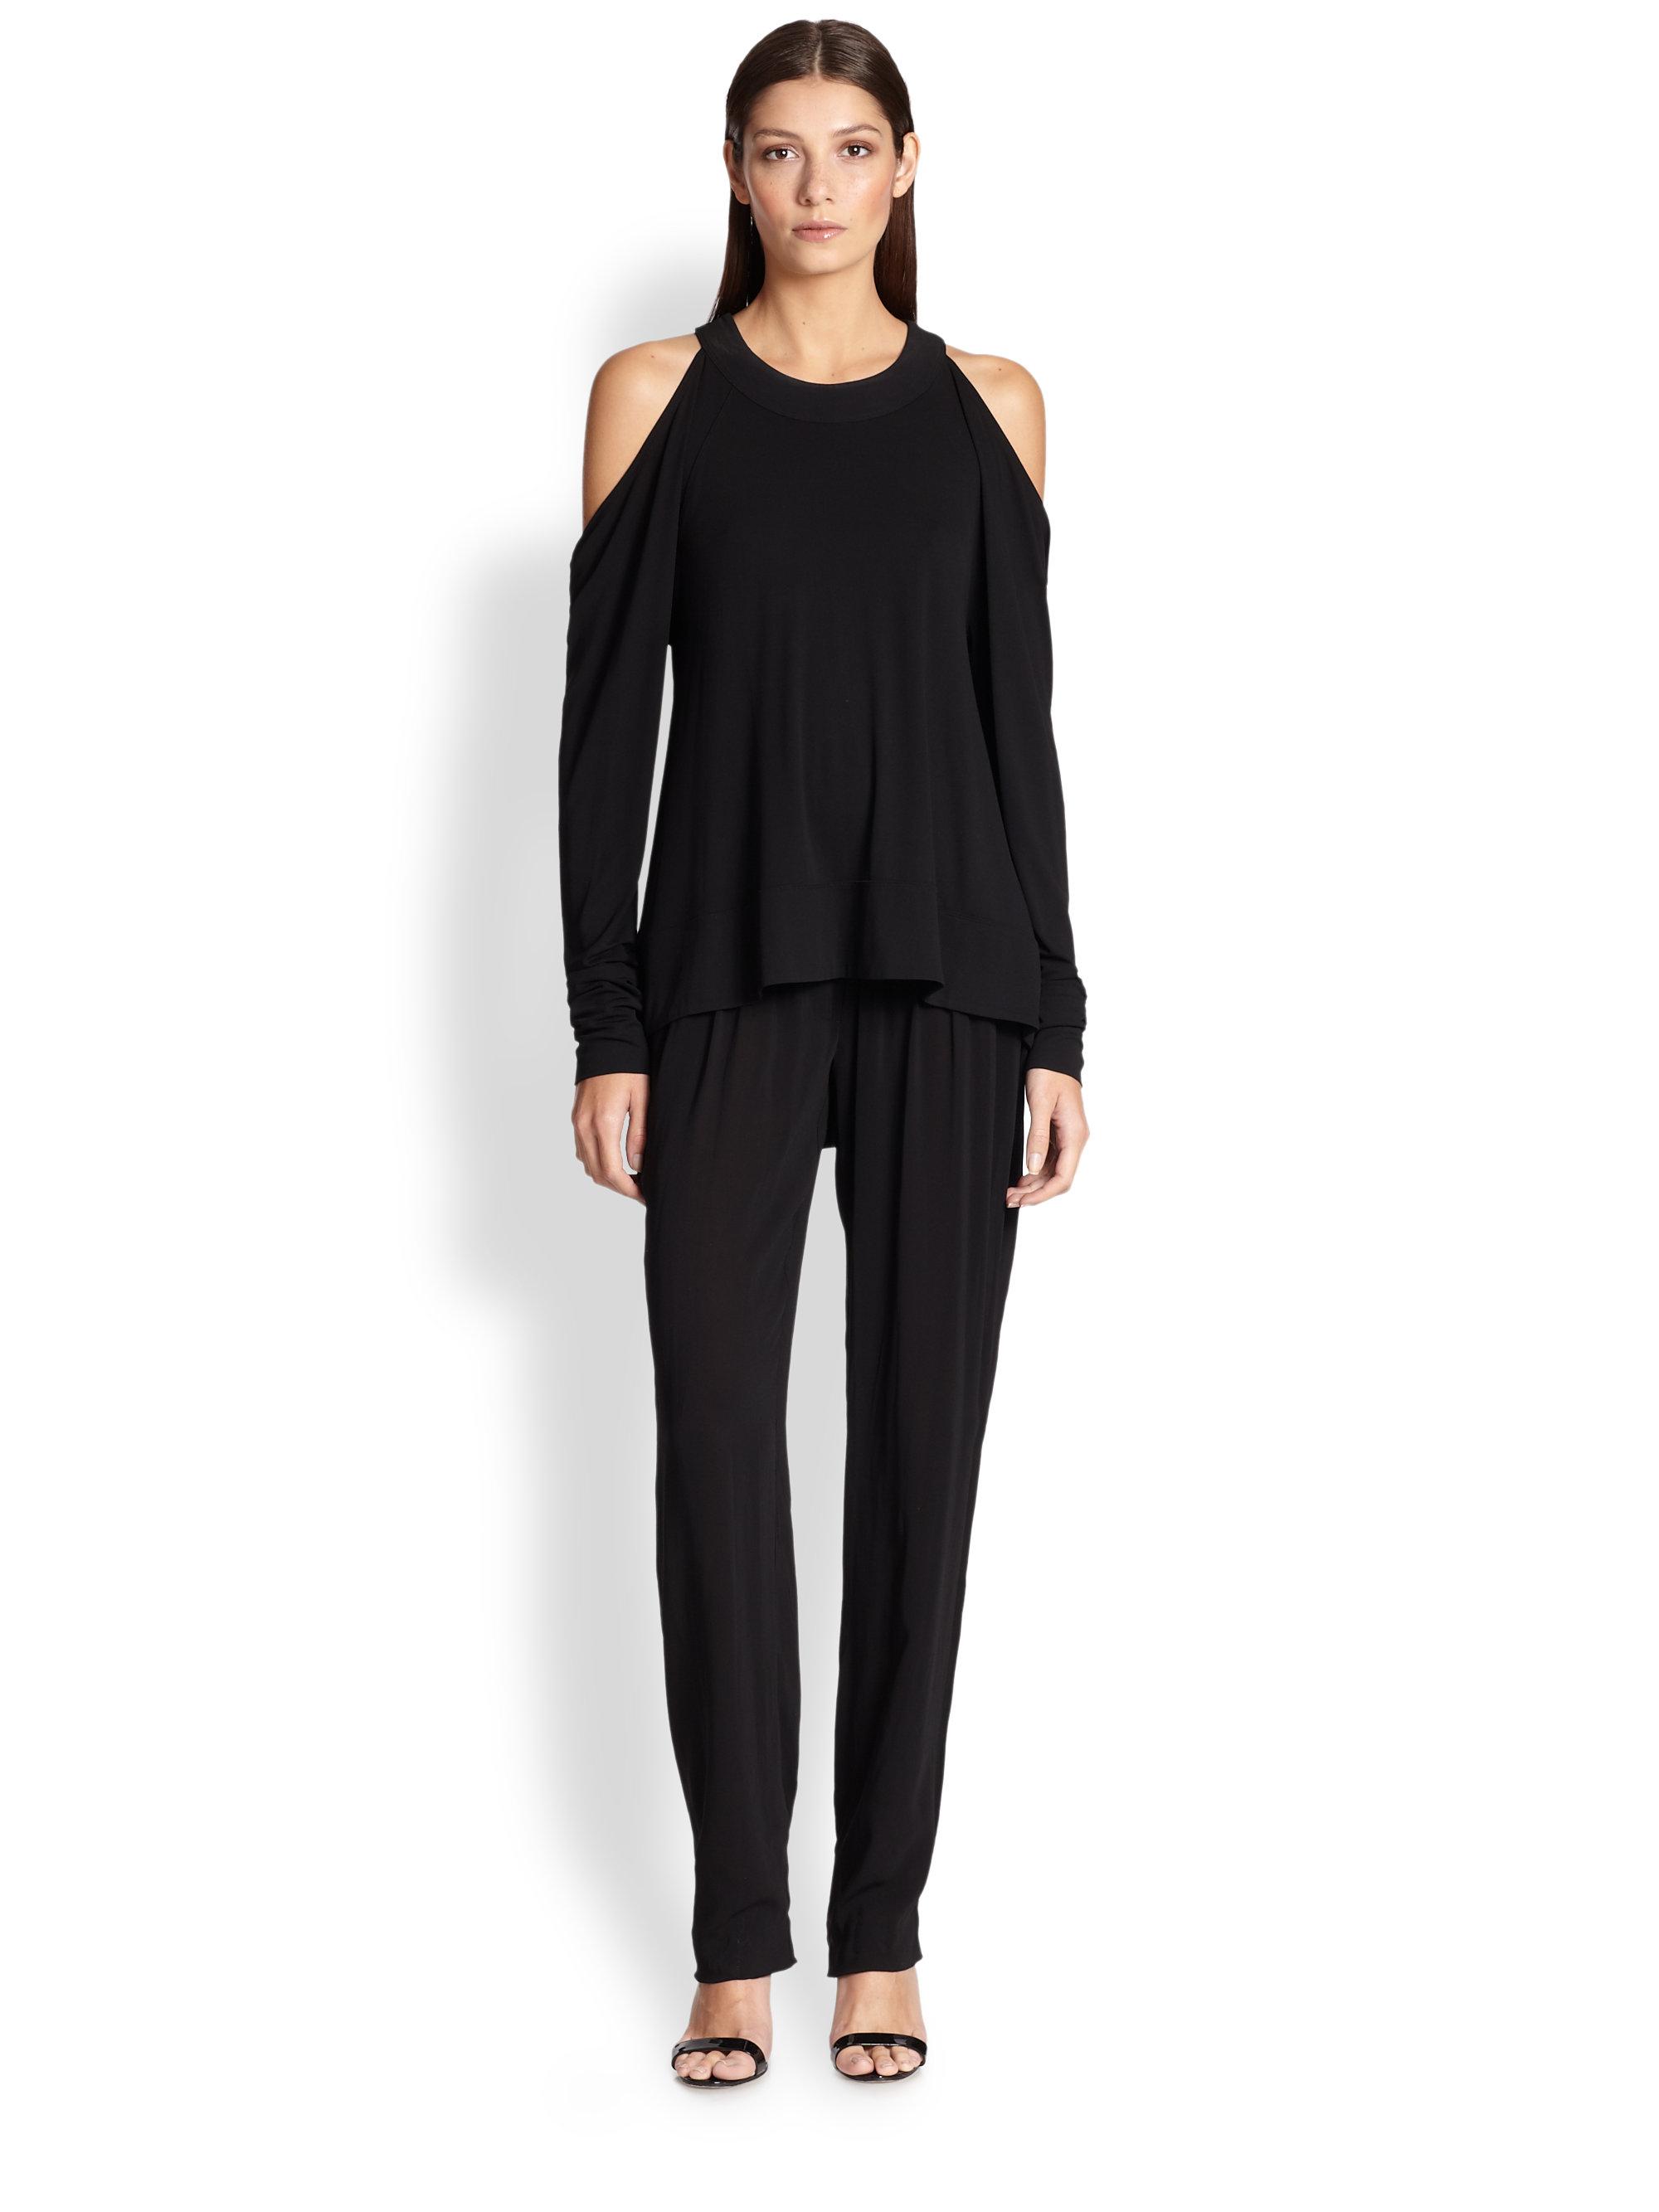 759bffa212eed Lyst - Donna Karan Cold-Shoulder Jersey Top in Black